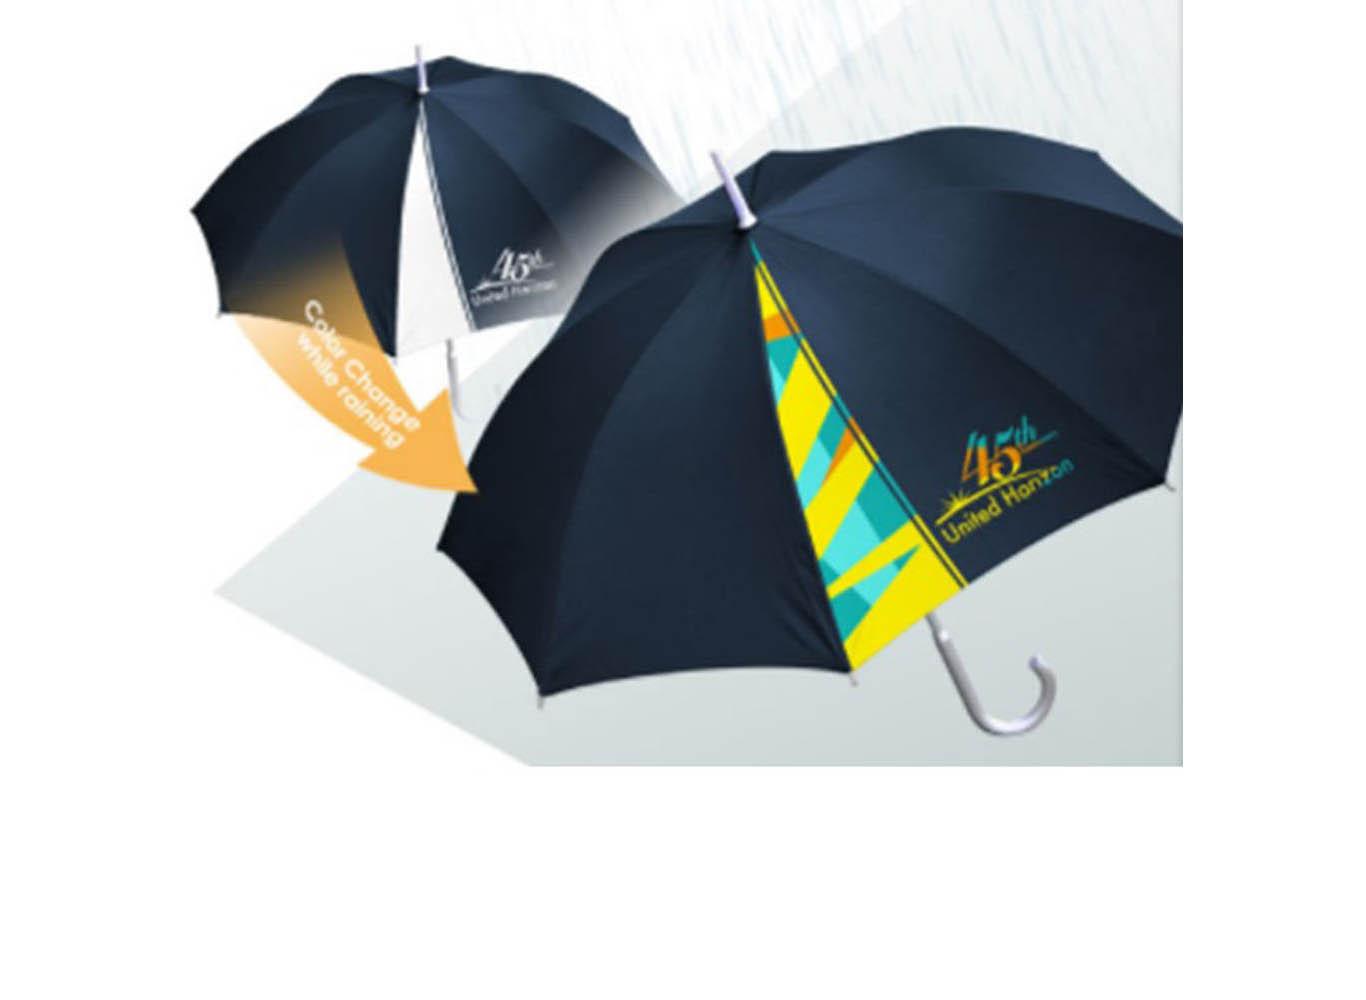 Custom Color Changing Umbrella